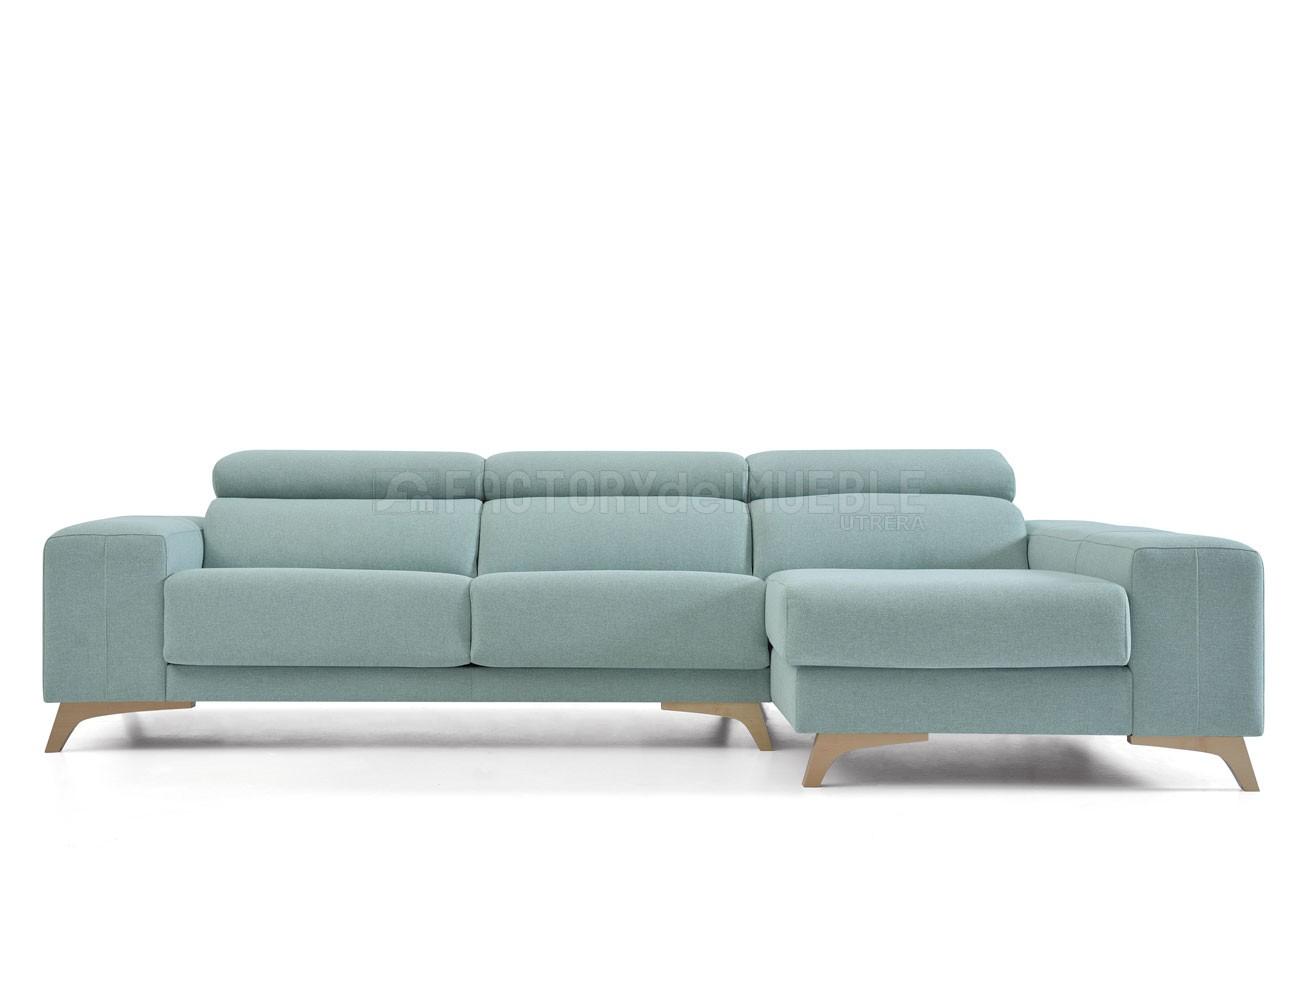 Sofa chaiselongue areca1